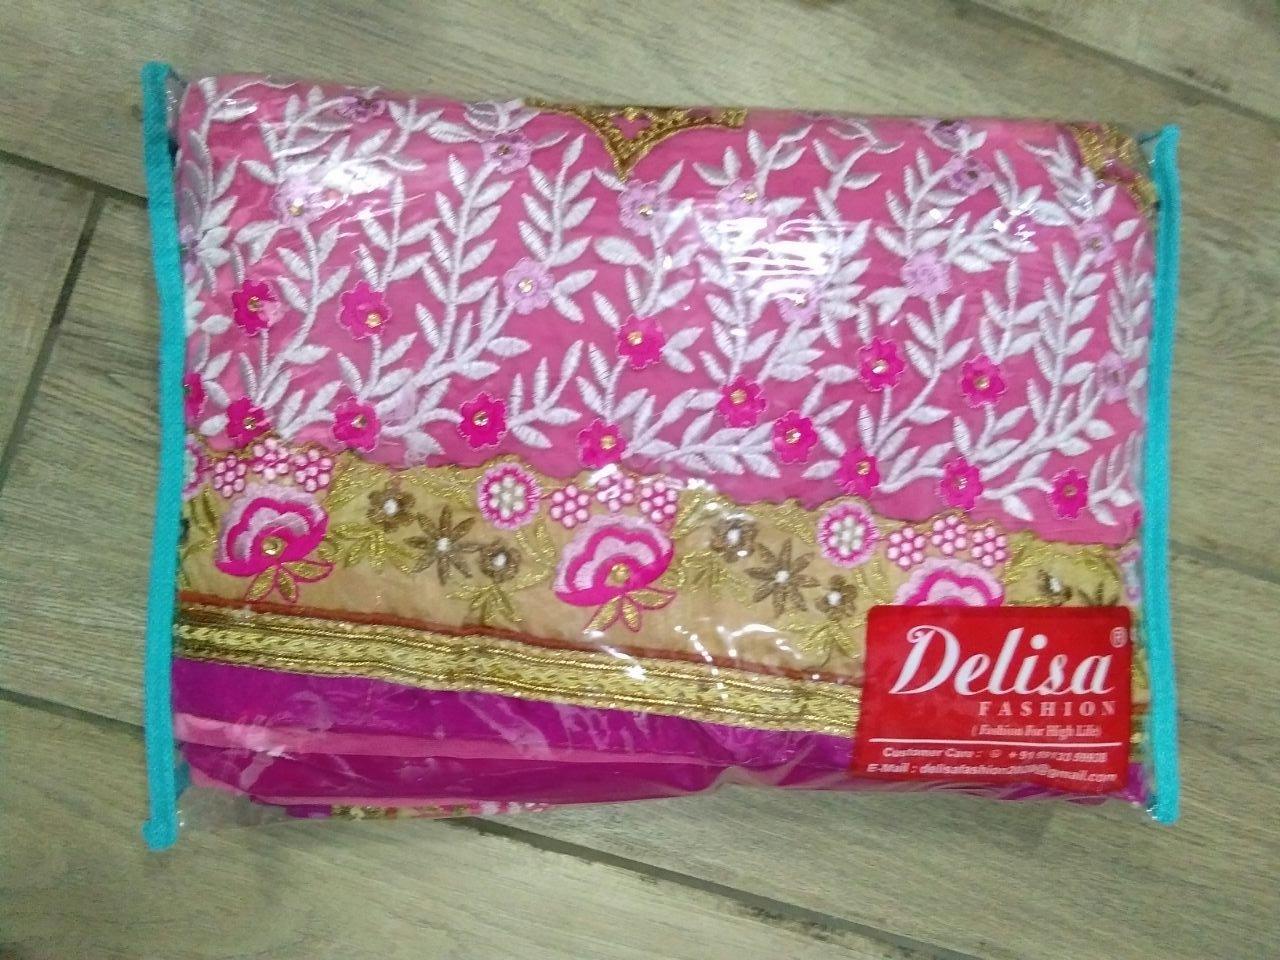 Delisa Fashion Ethnic Designer Bollywood Party Wear Pakistani Indian Saree tirupati by Delisa (Image #5)